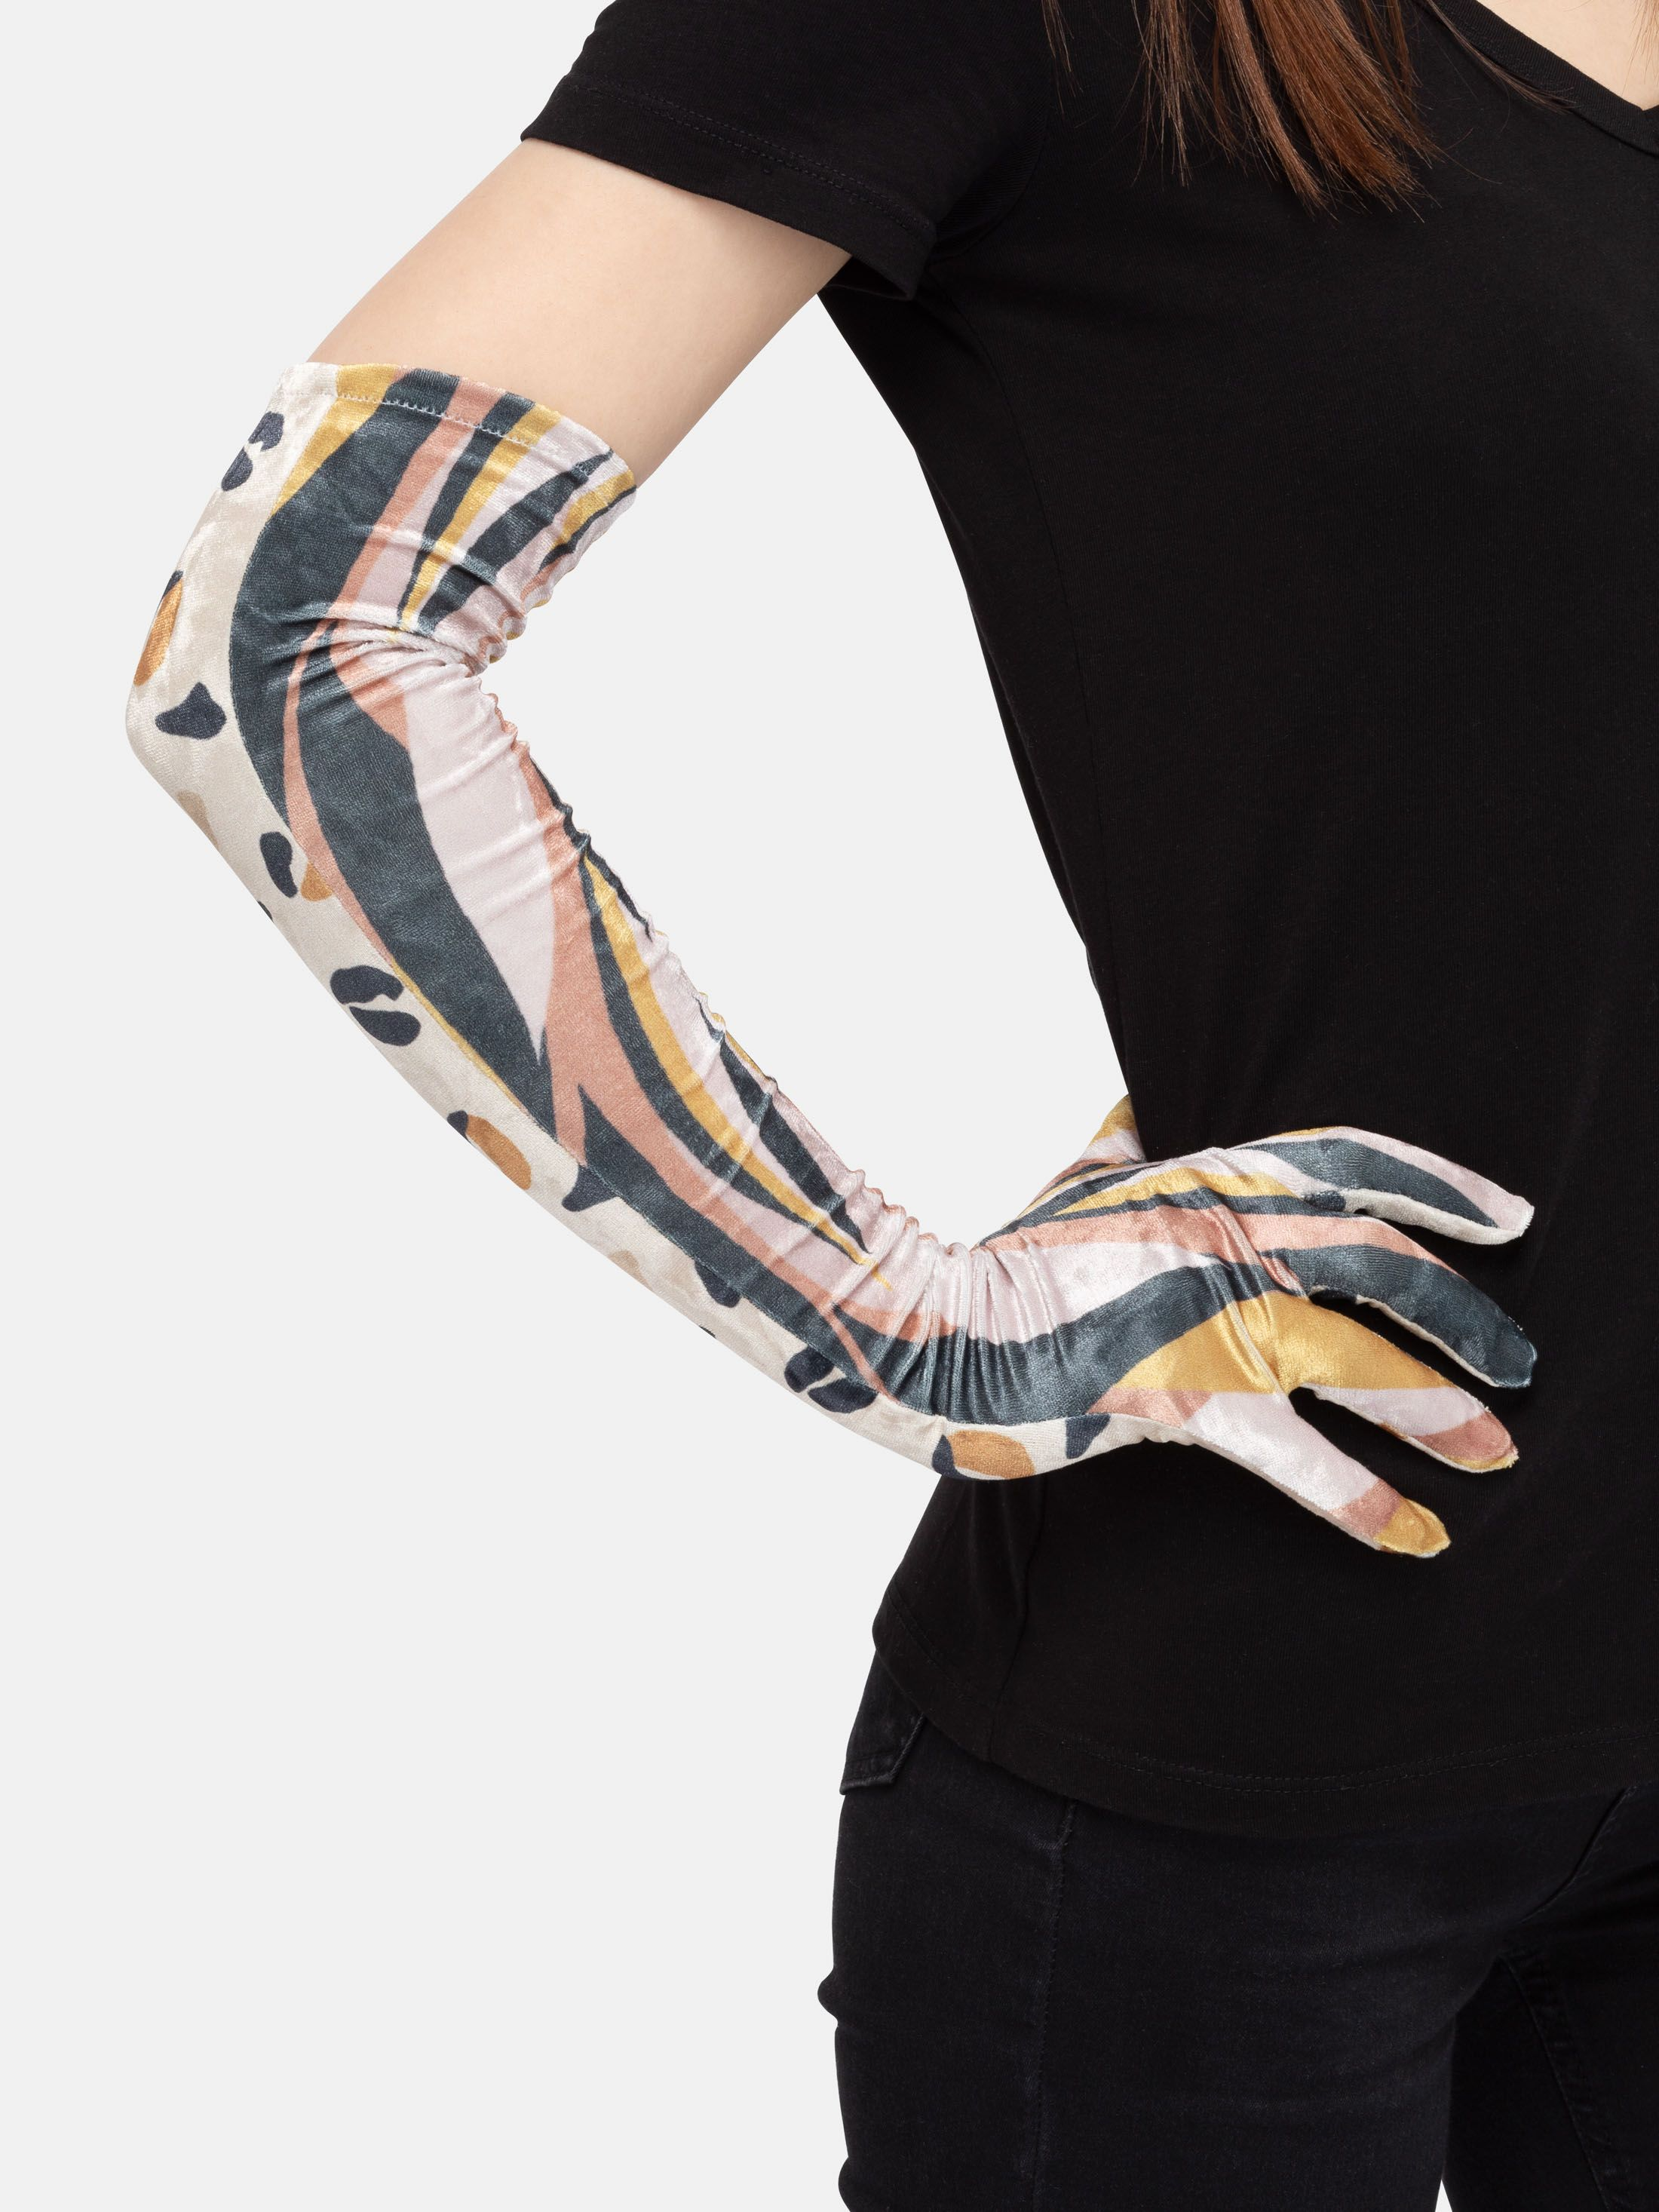 custom opera gloves